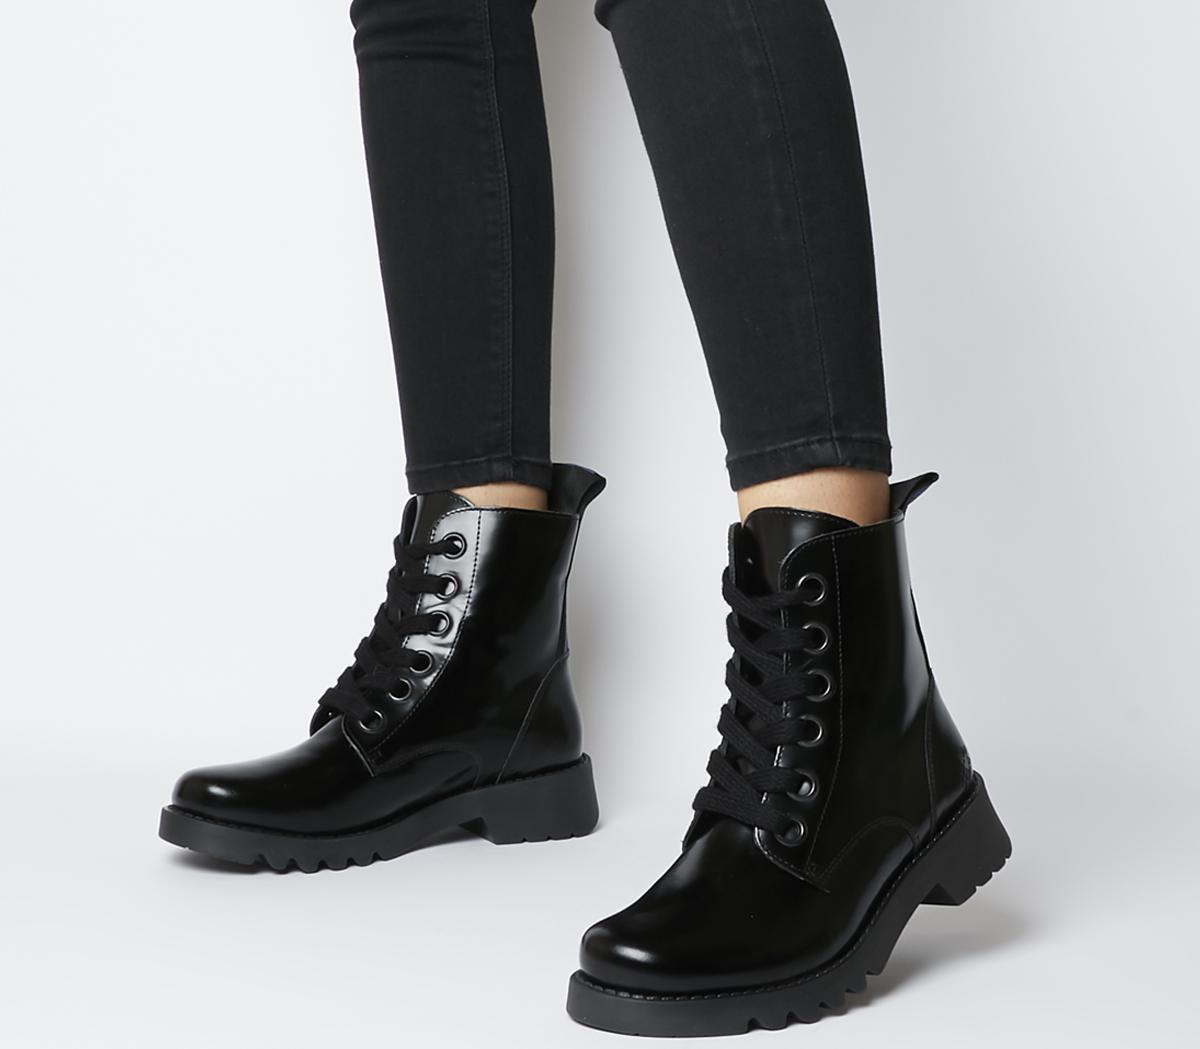 Fly London Ragi Boots Black - Womens Boots